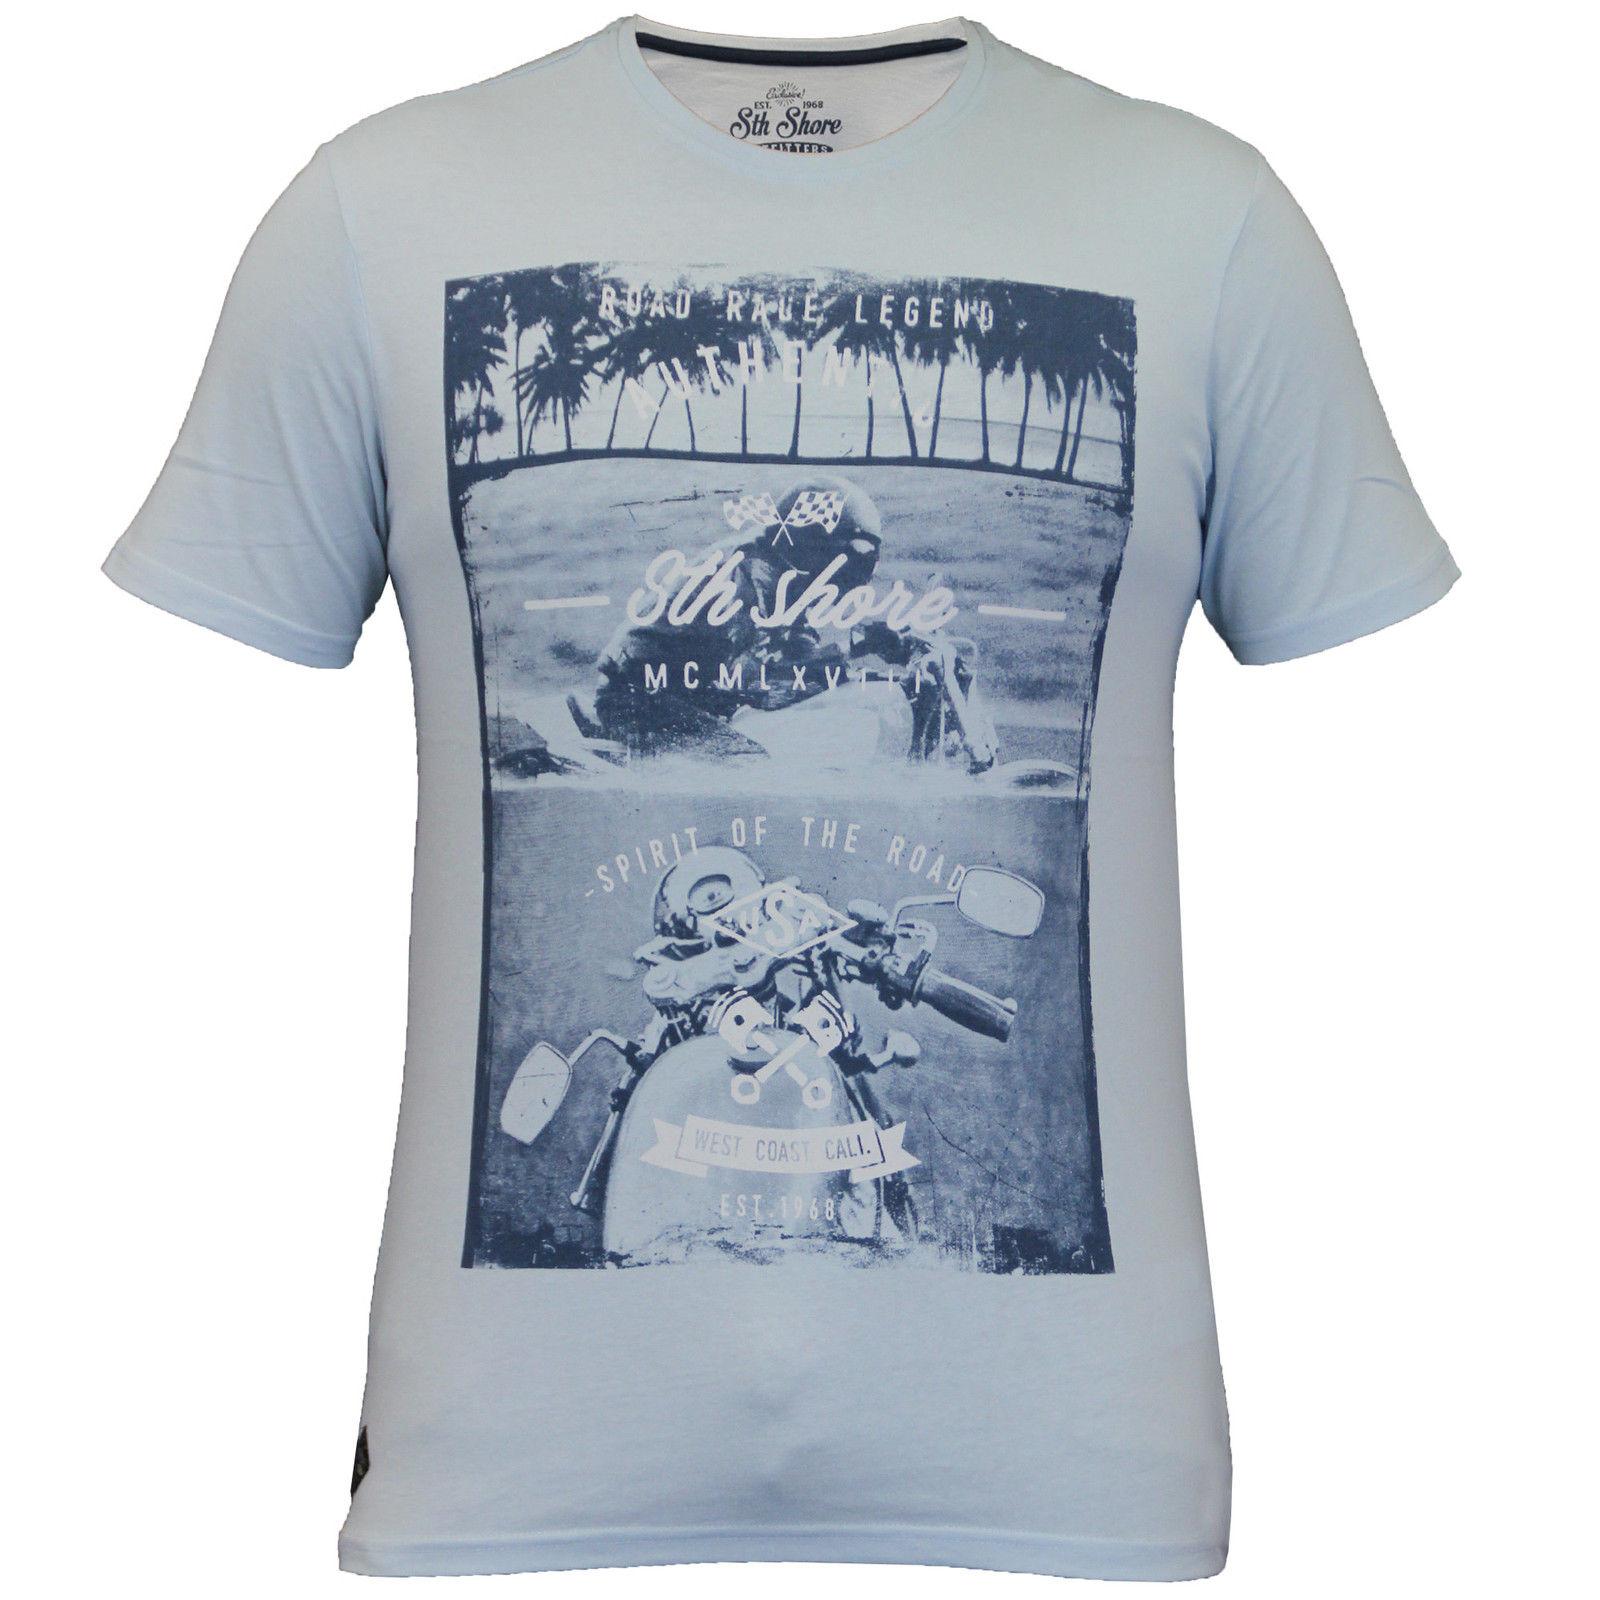 61ddaa7fd Mens South Shore Graphic Photo Print T-shirt Assorted Designer Cotton Tee  Shirt. Thumbnail 11